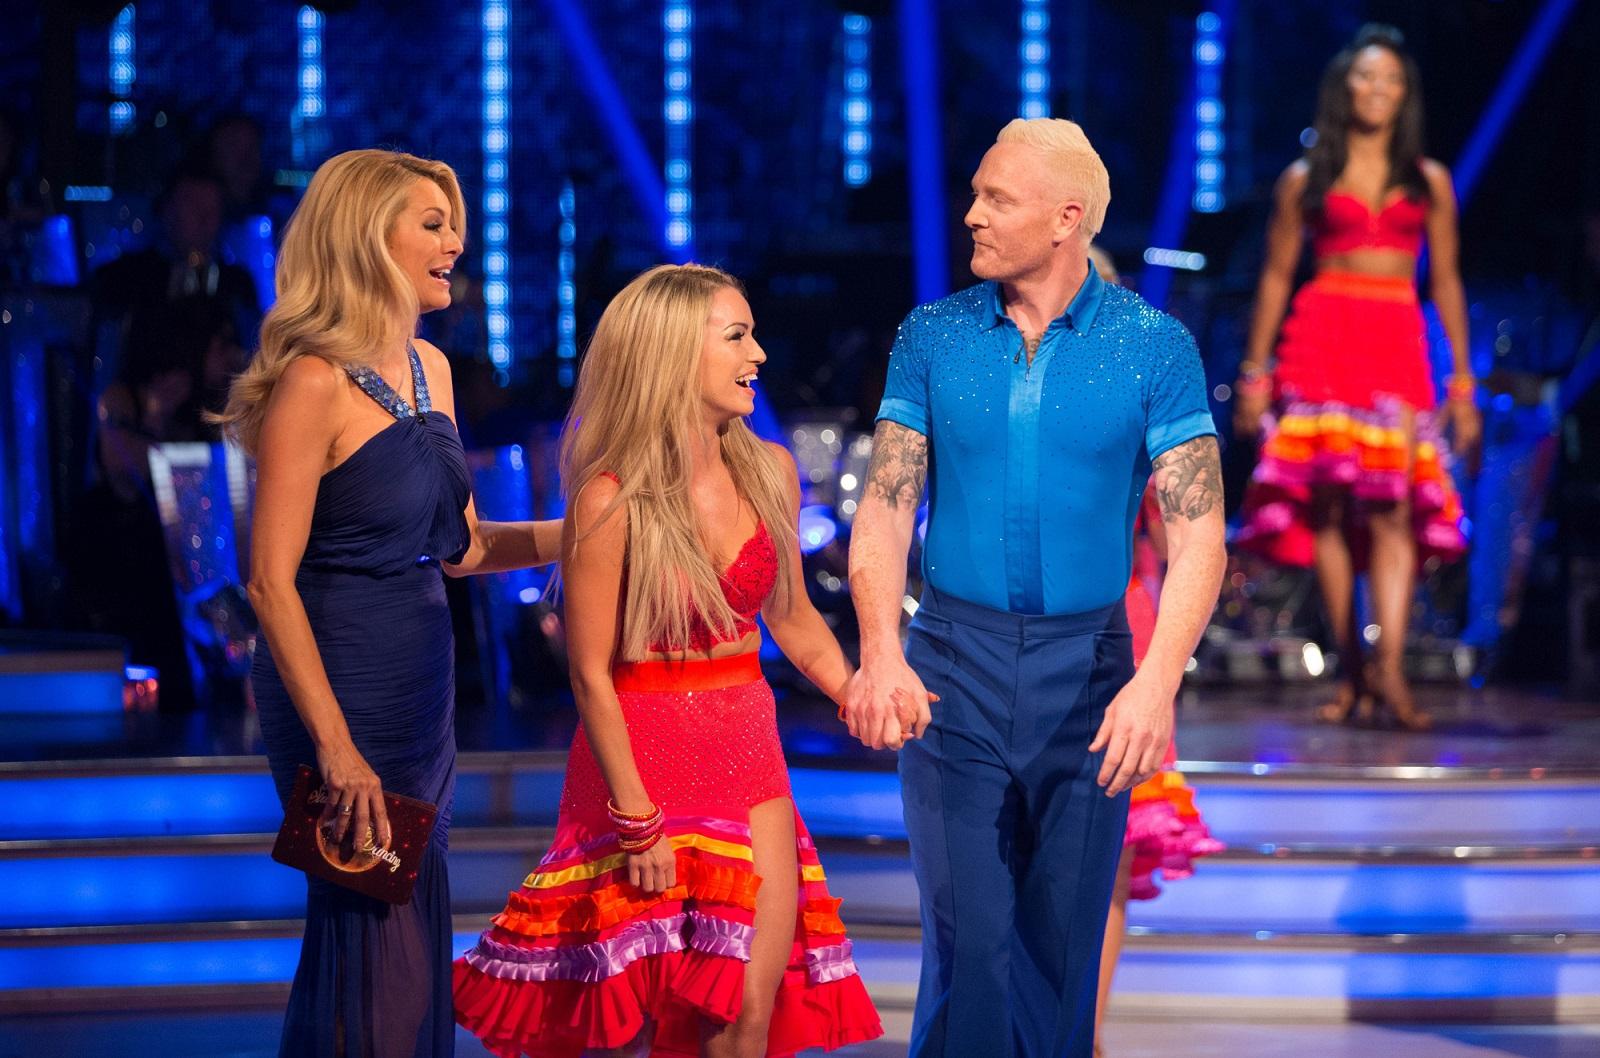 Ola Jordan Iwan Thomas Strictly Come Dancing